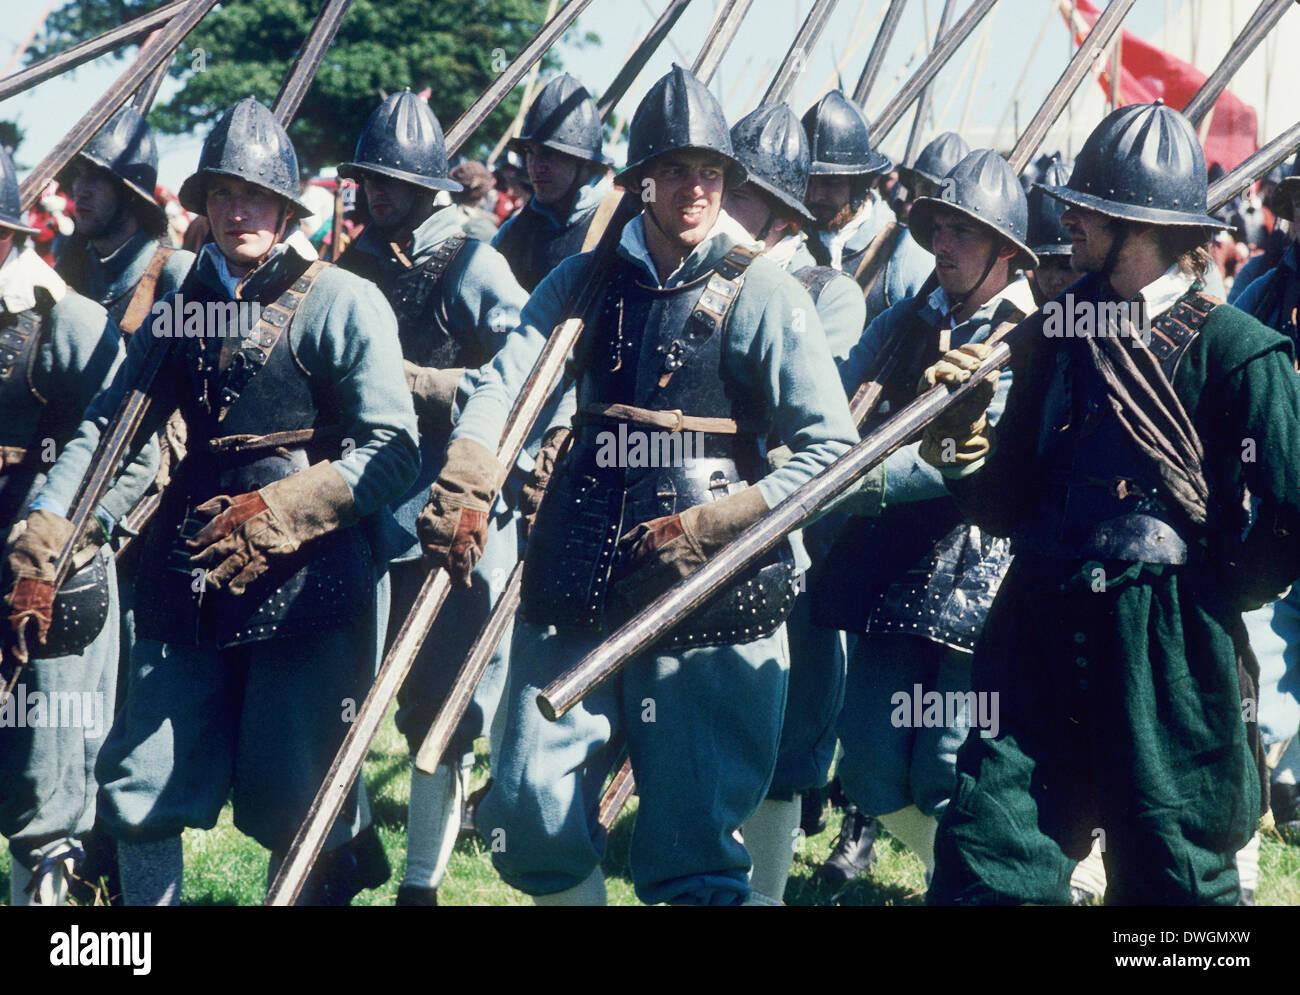 English Civil War, Royalist Pikemen, 17th century, historical re-enactment - Stock Image